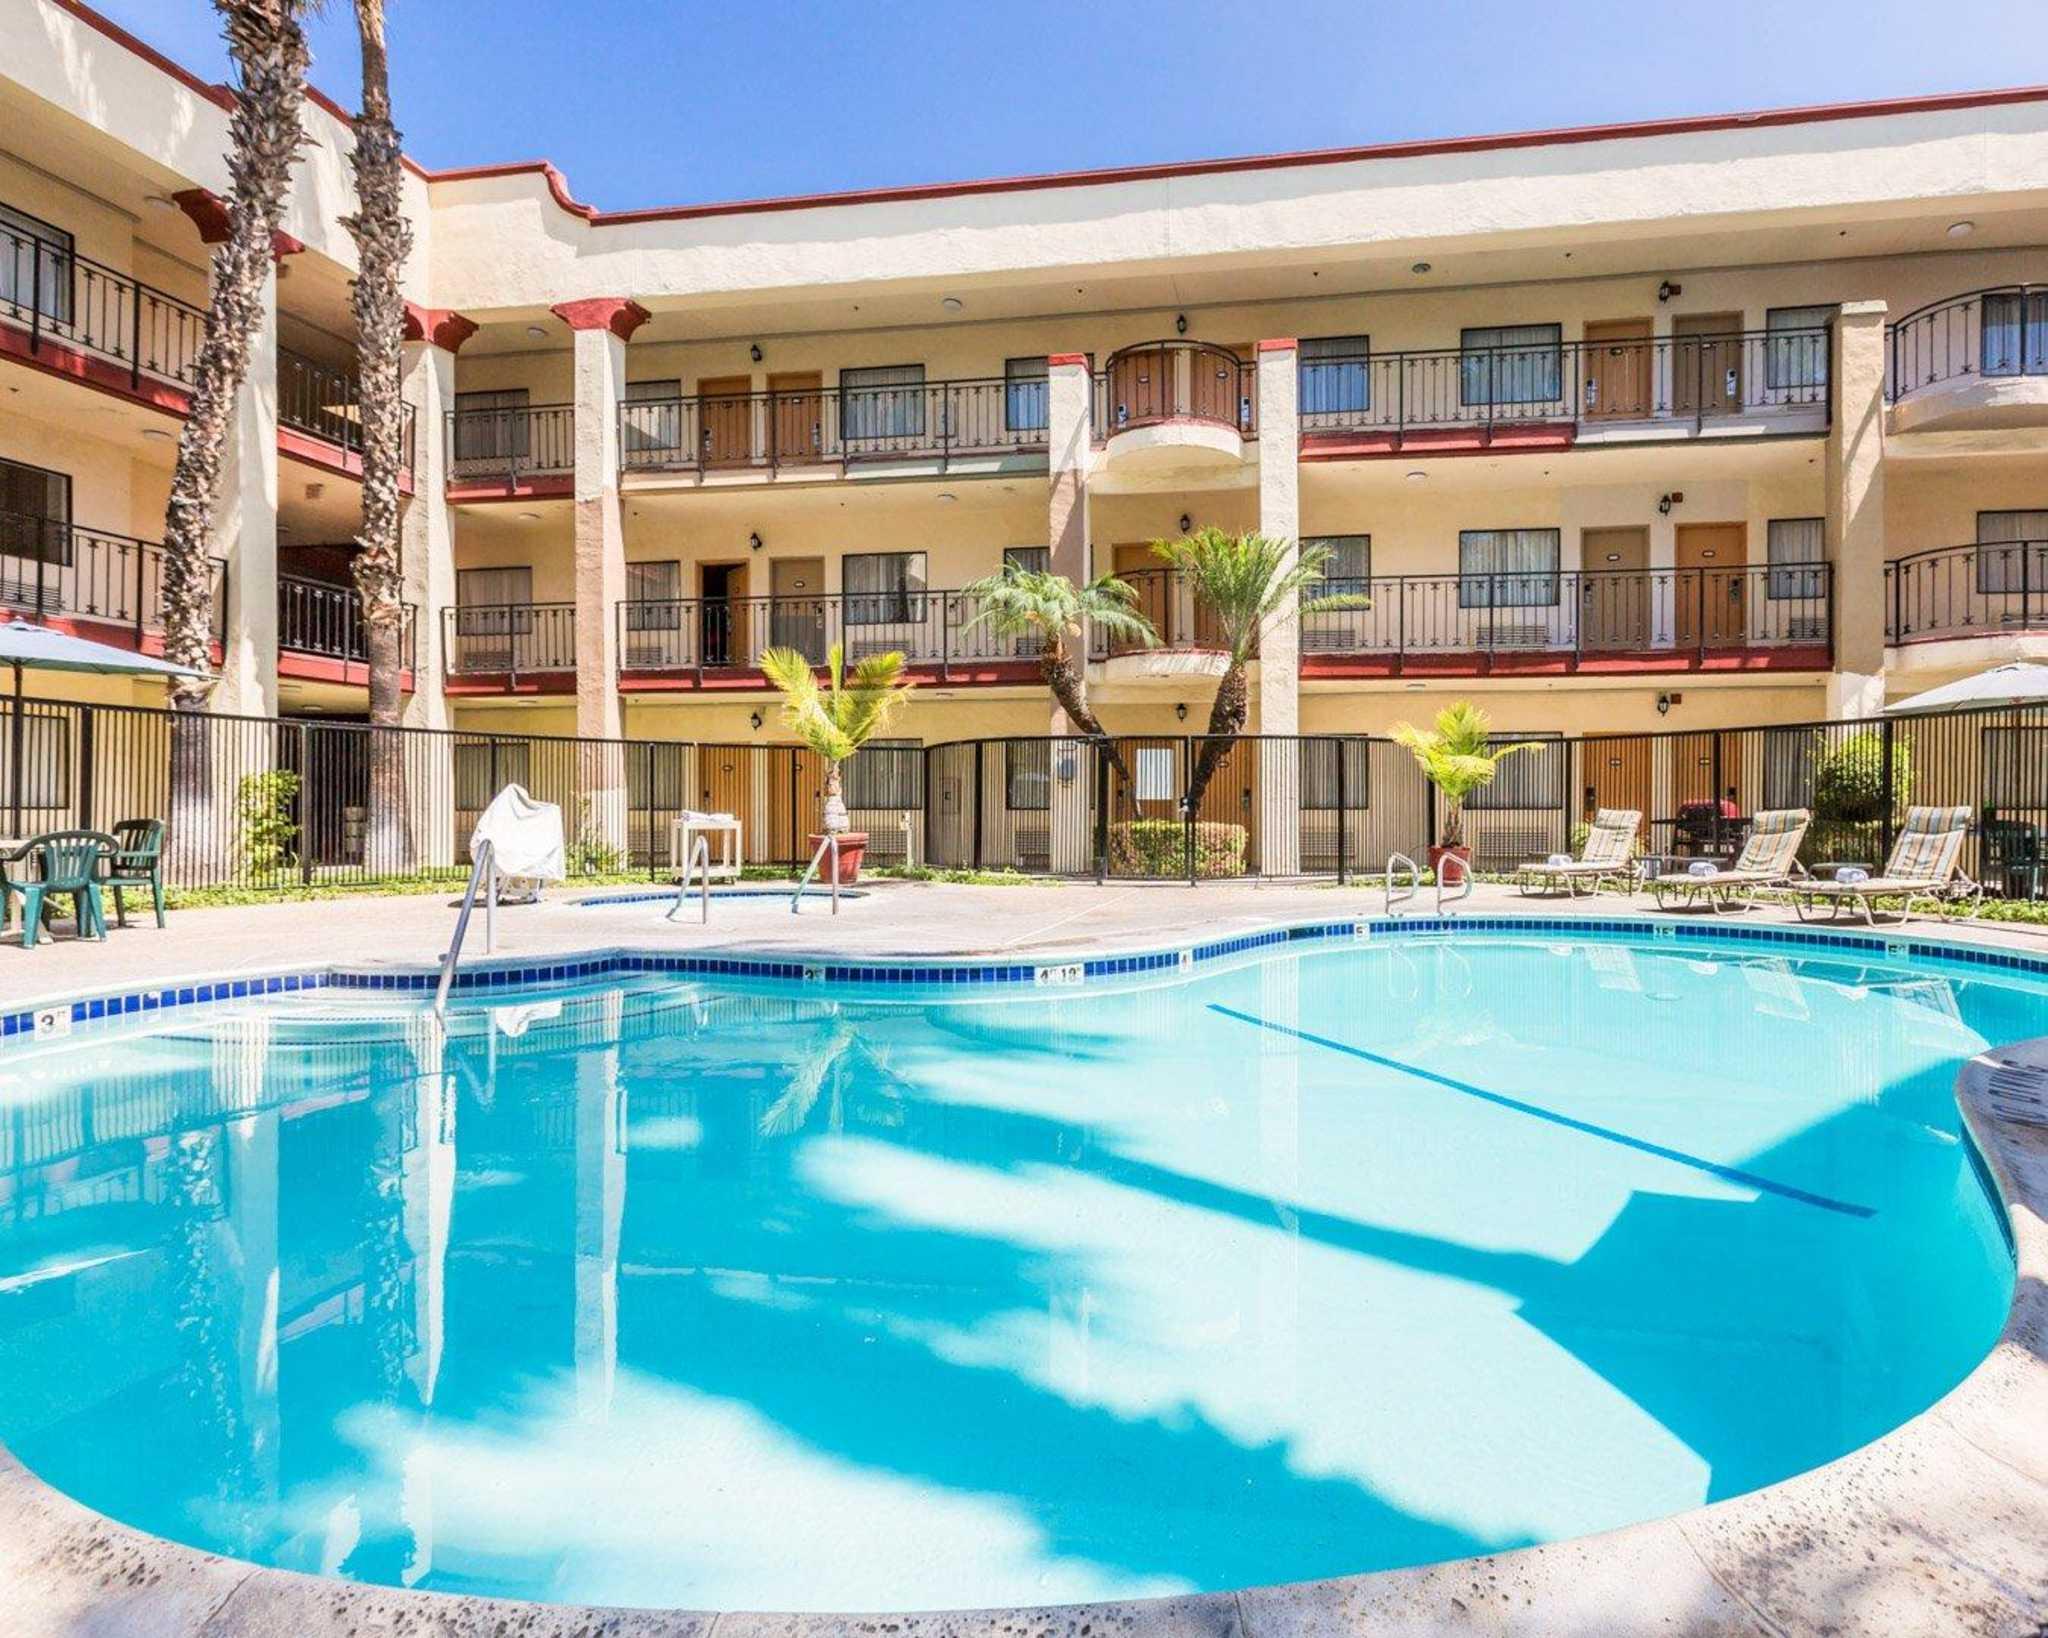 Inviting Anaheim, CA Hotel – Best Western PLUS Stovall's Inn